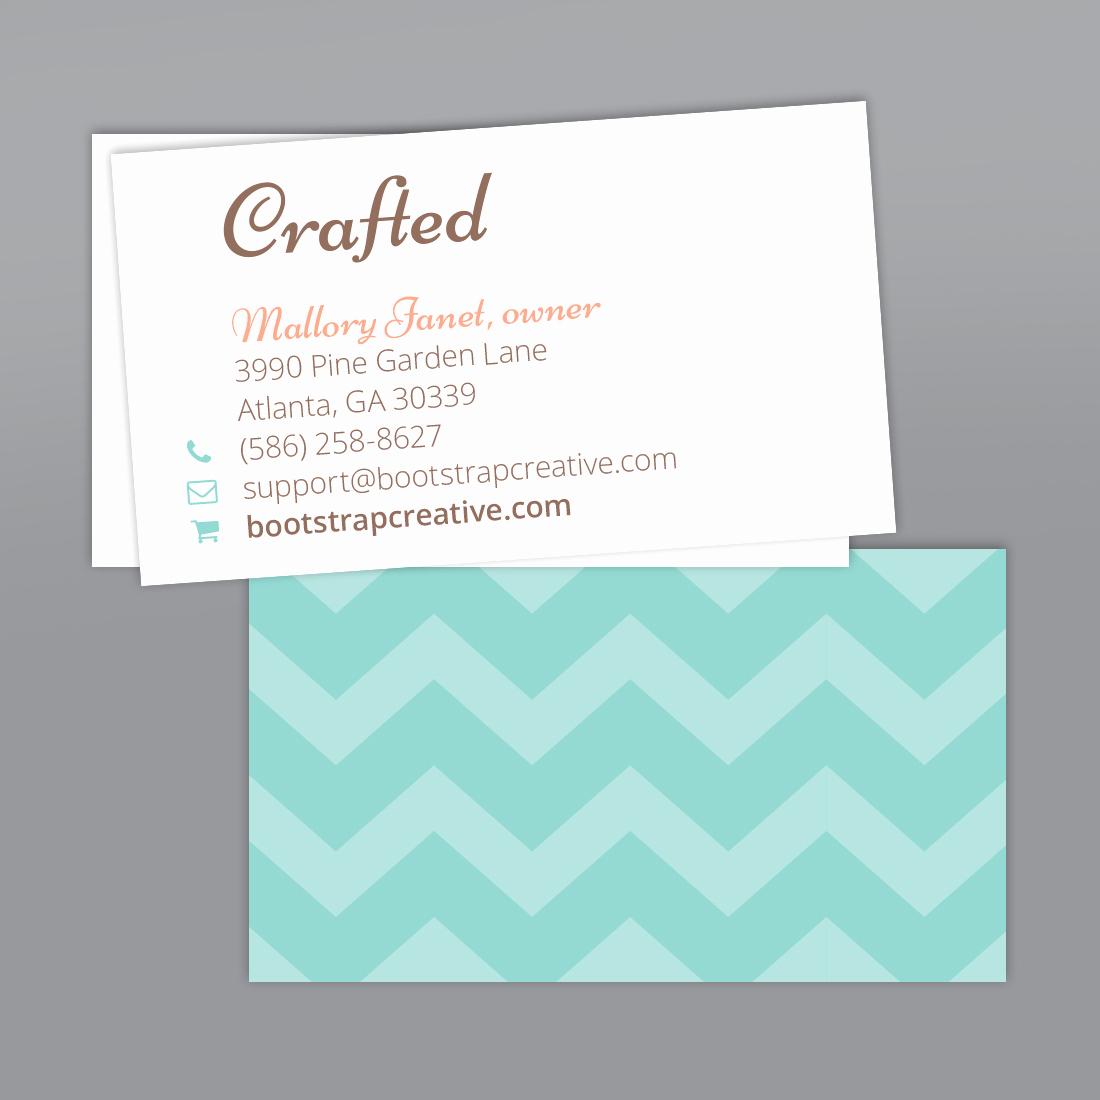 Indesign Business Card Template Inspirational Business Card Template Indesign 8 Up Business Card